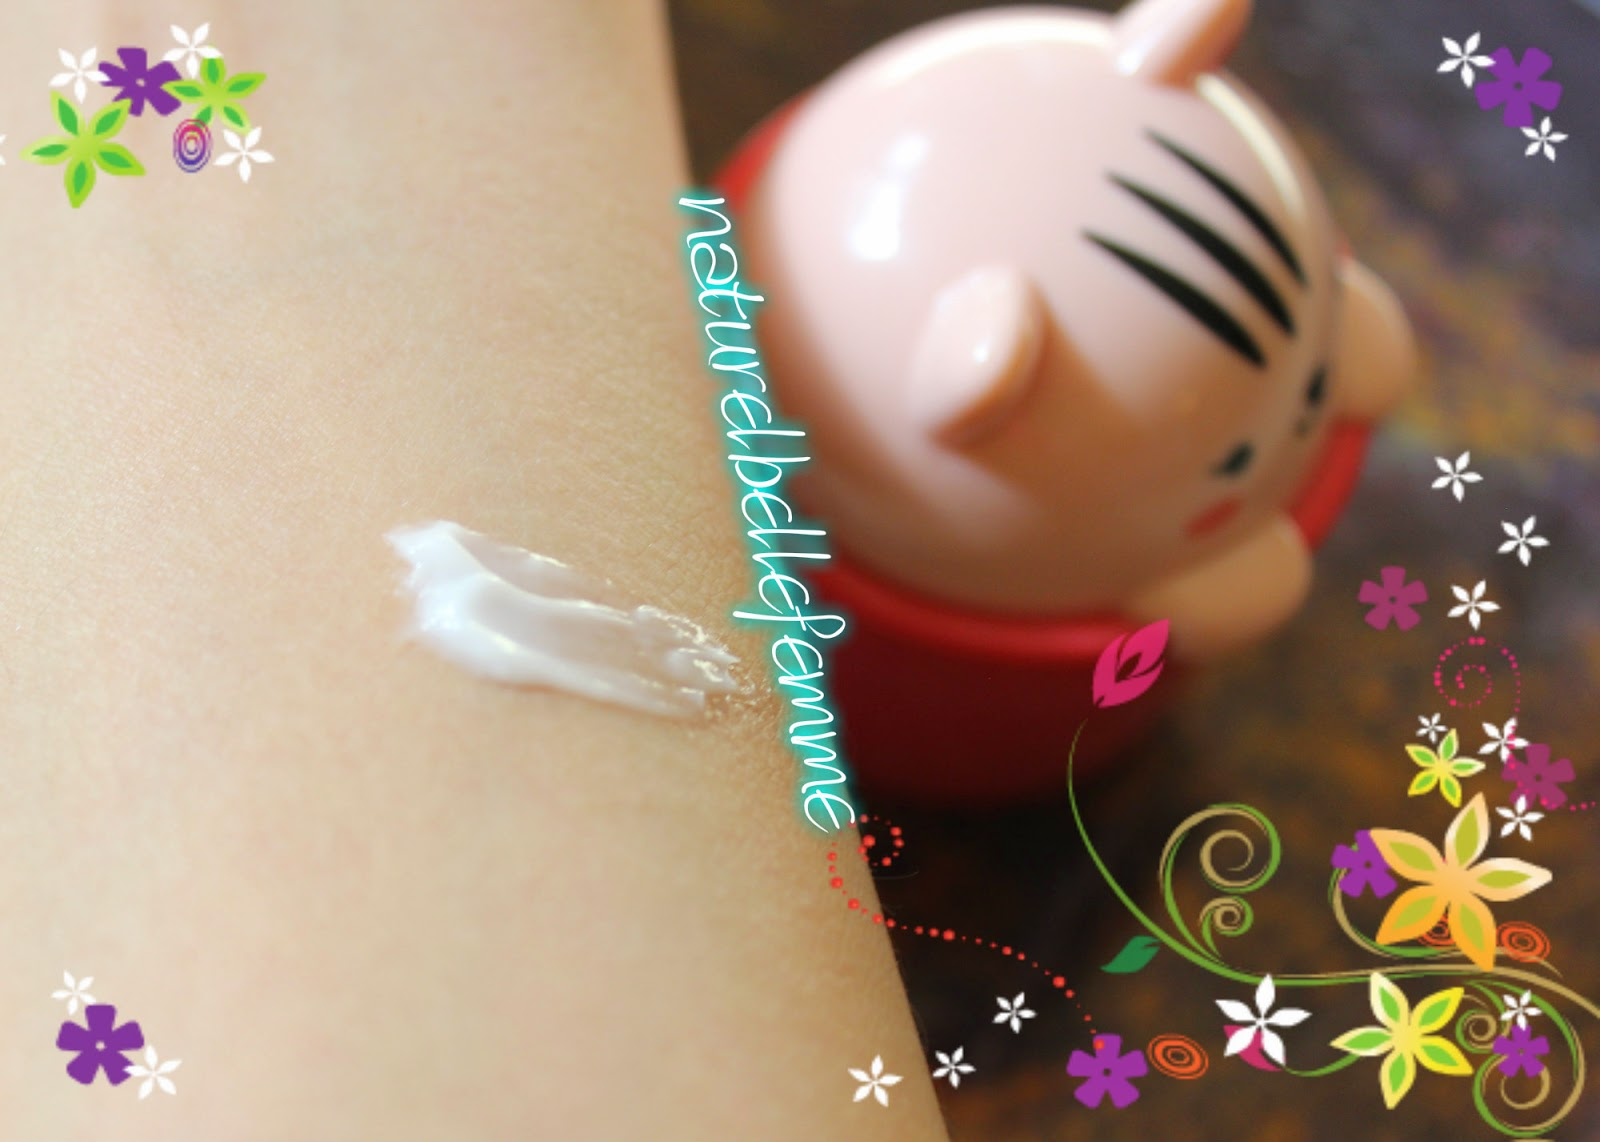 Face shop floral hand cream